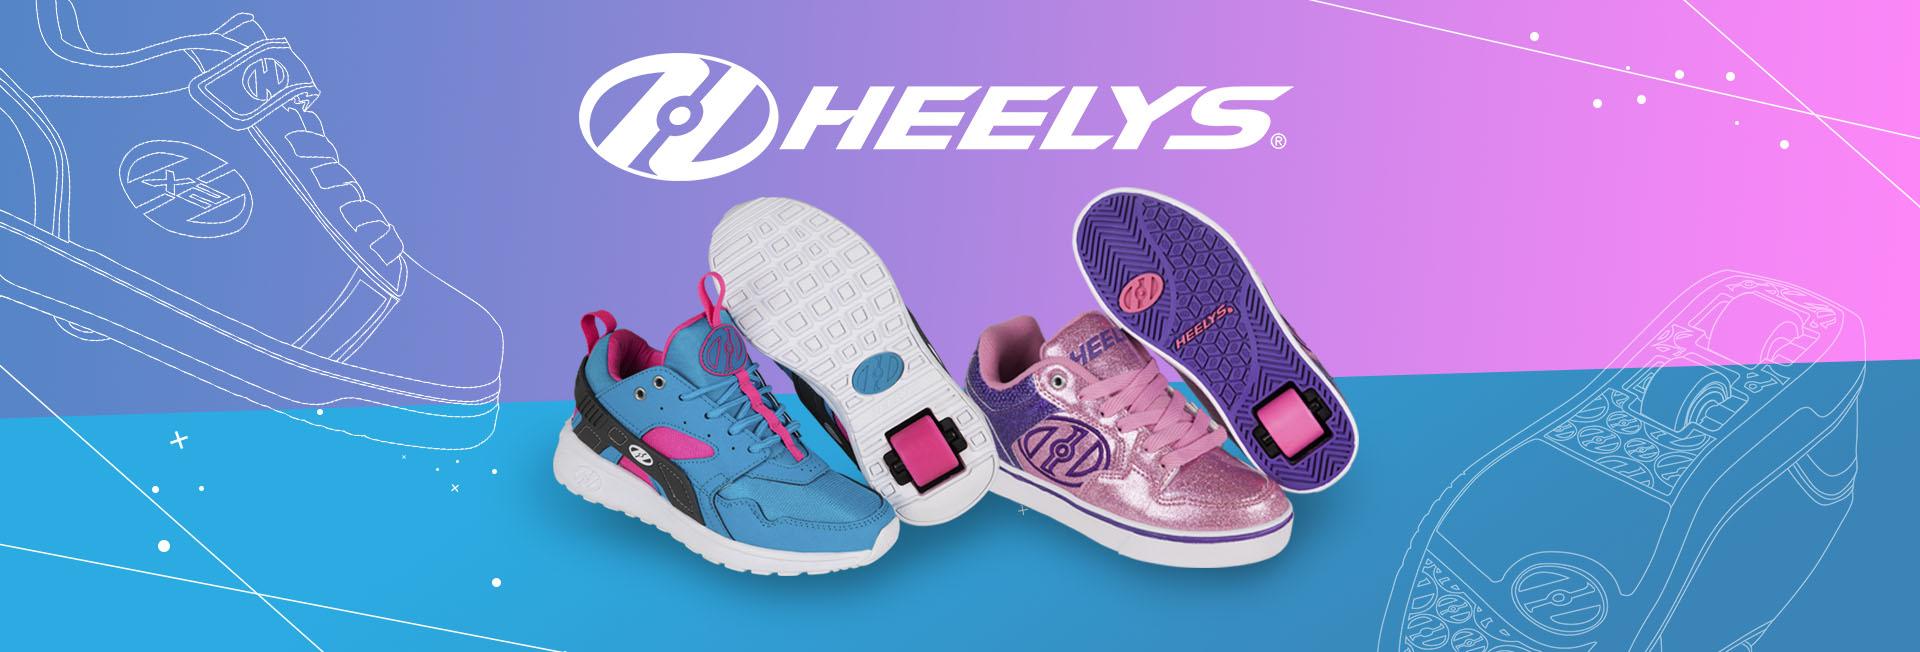 Heelys are the original wheeled shoe